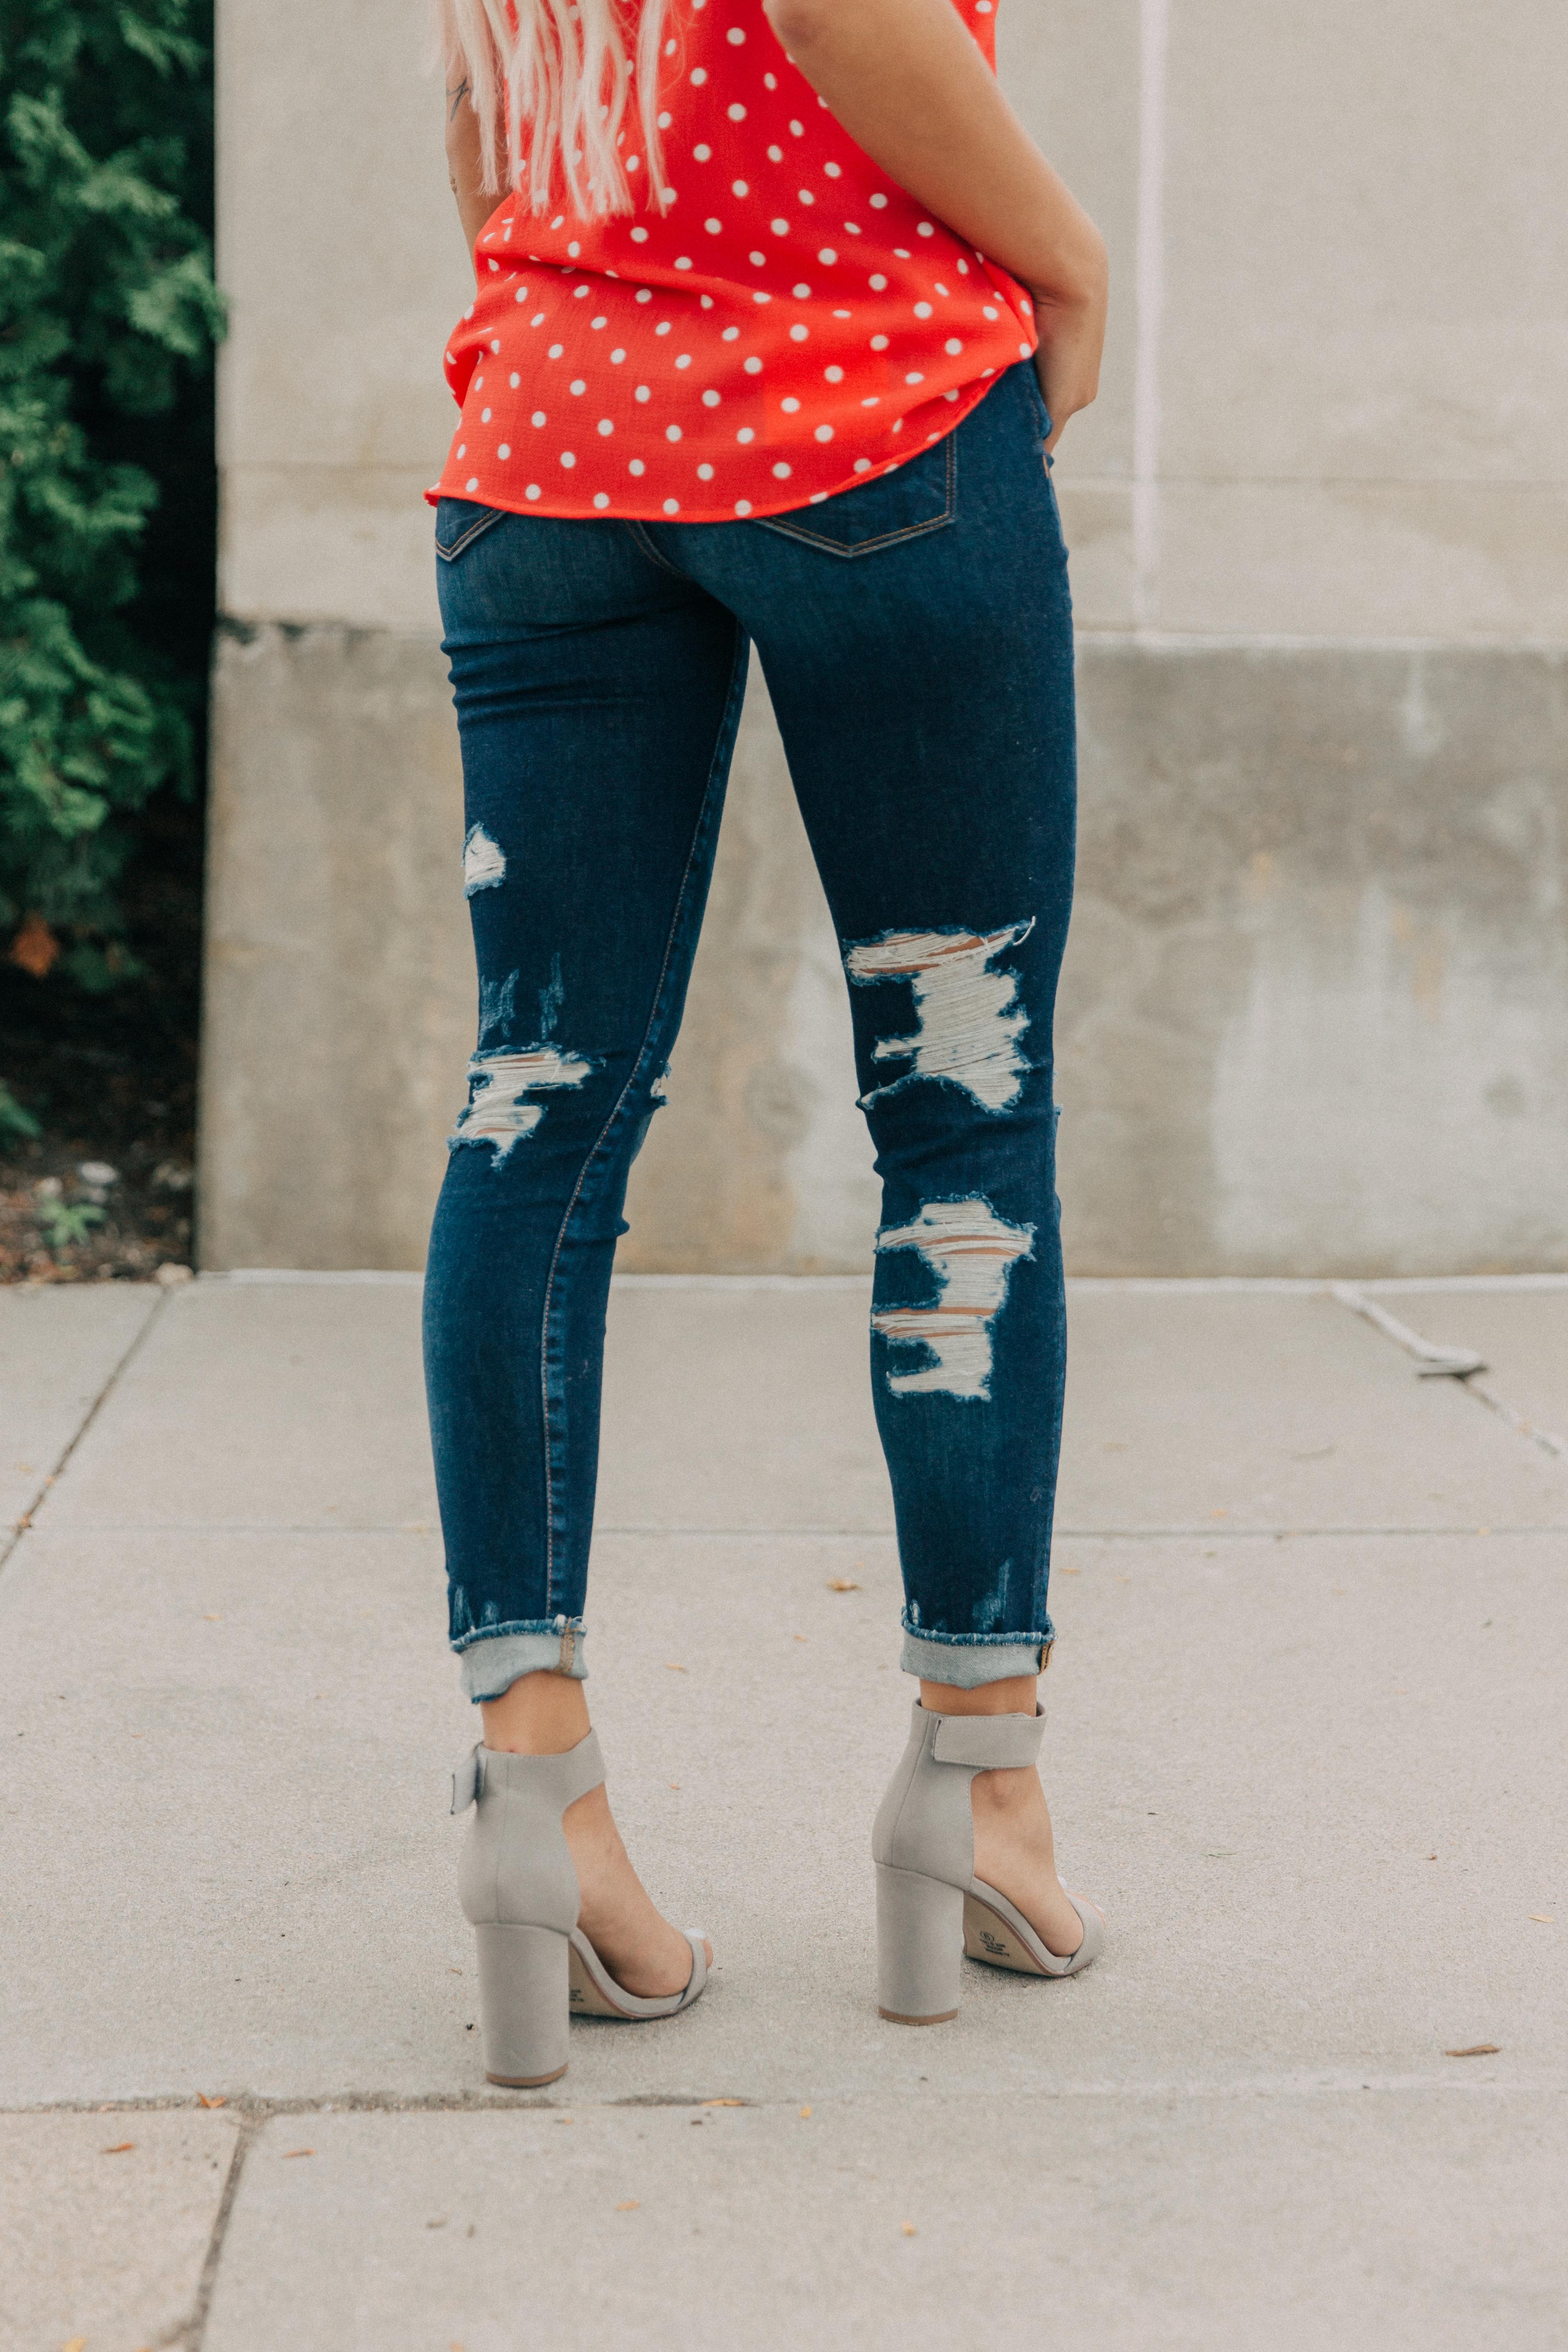 Bridge By GLY Dark Wash Back Destruction Skinny Denim Jeans - Buckle